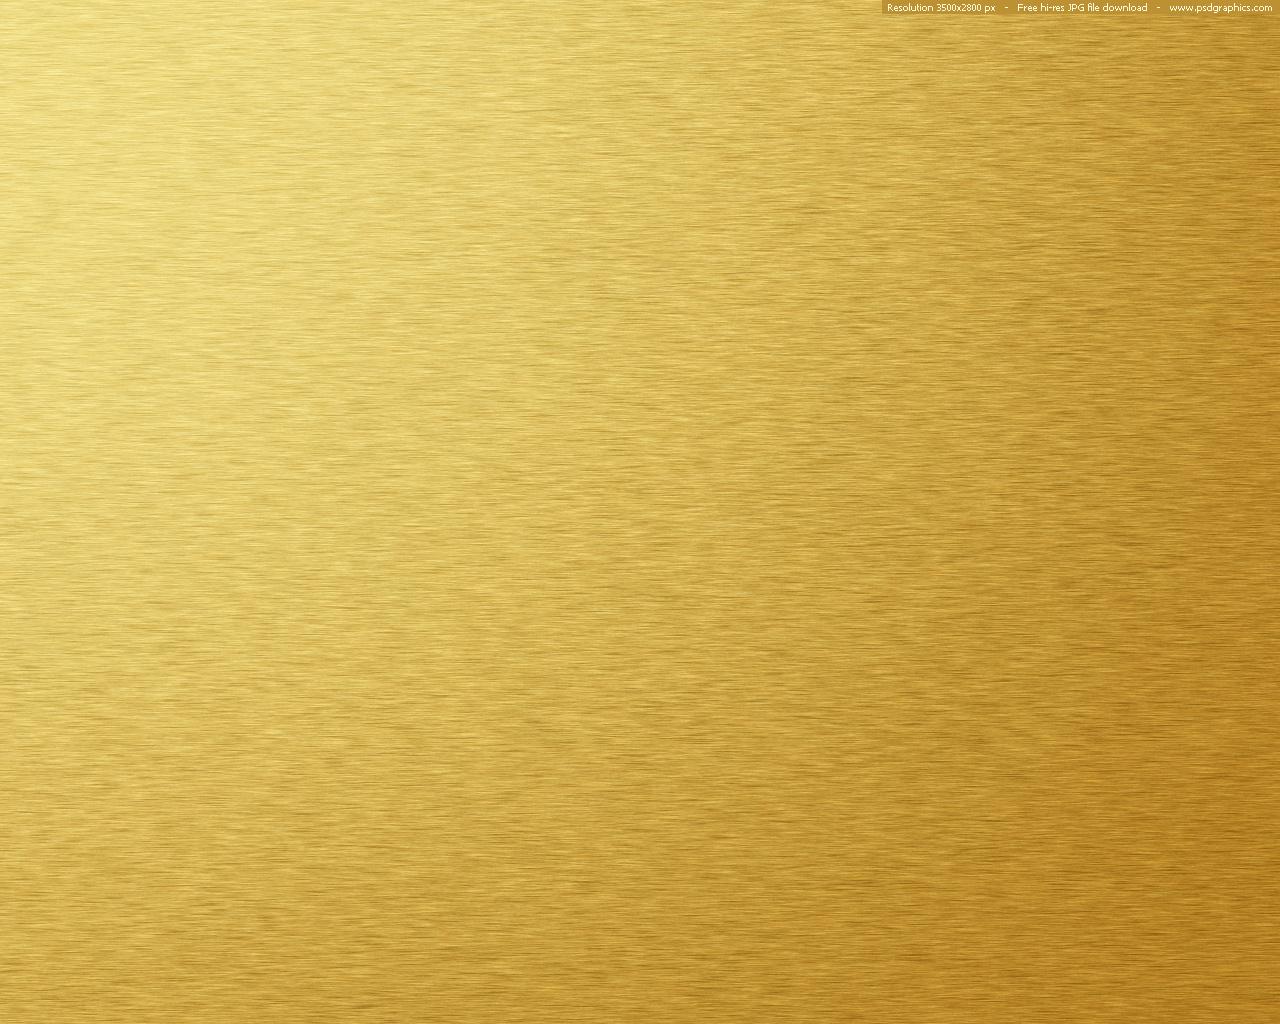 http://3.bp.blogspot.com/-yB0wdgepspo/TbgujXh0clI/AAAAAAAAHWE/_hlqcCNfdYM/s1600/gold-pattern.jpg